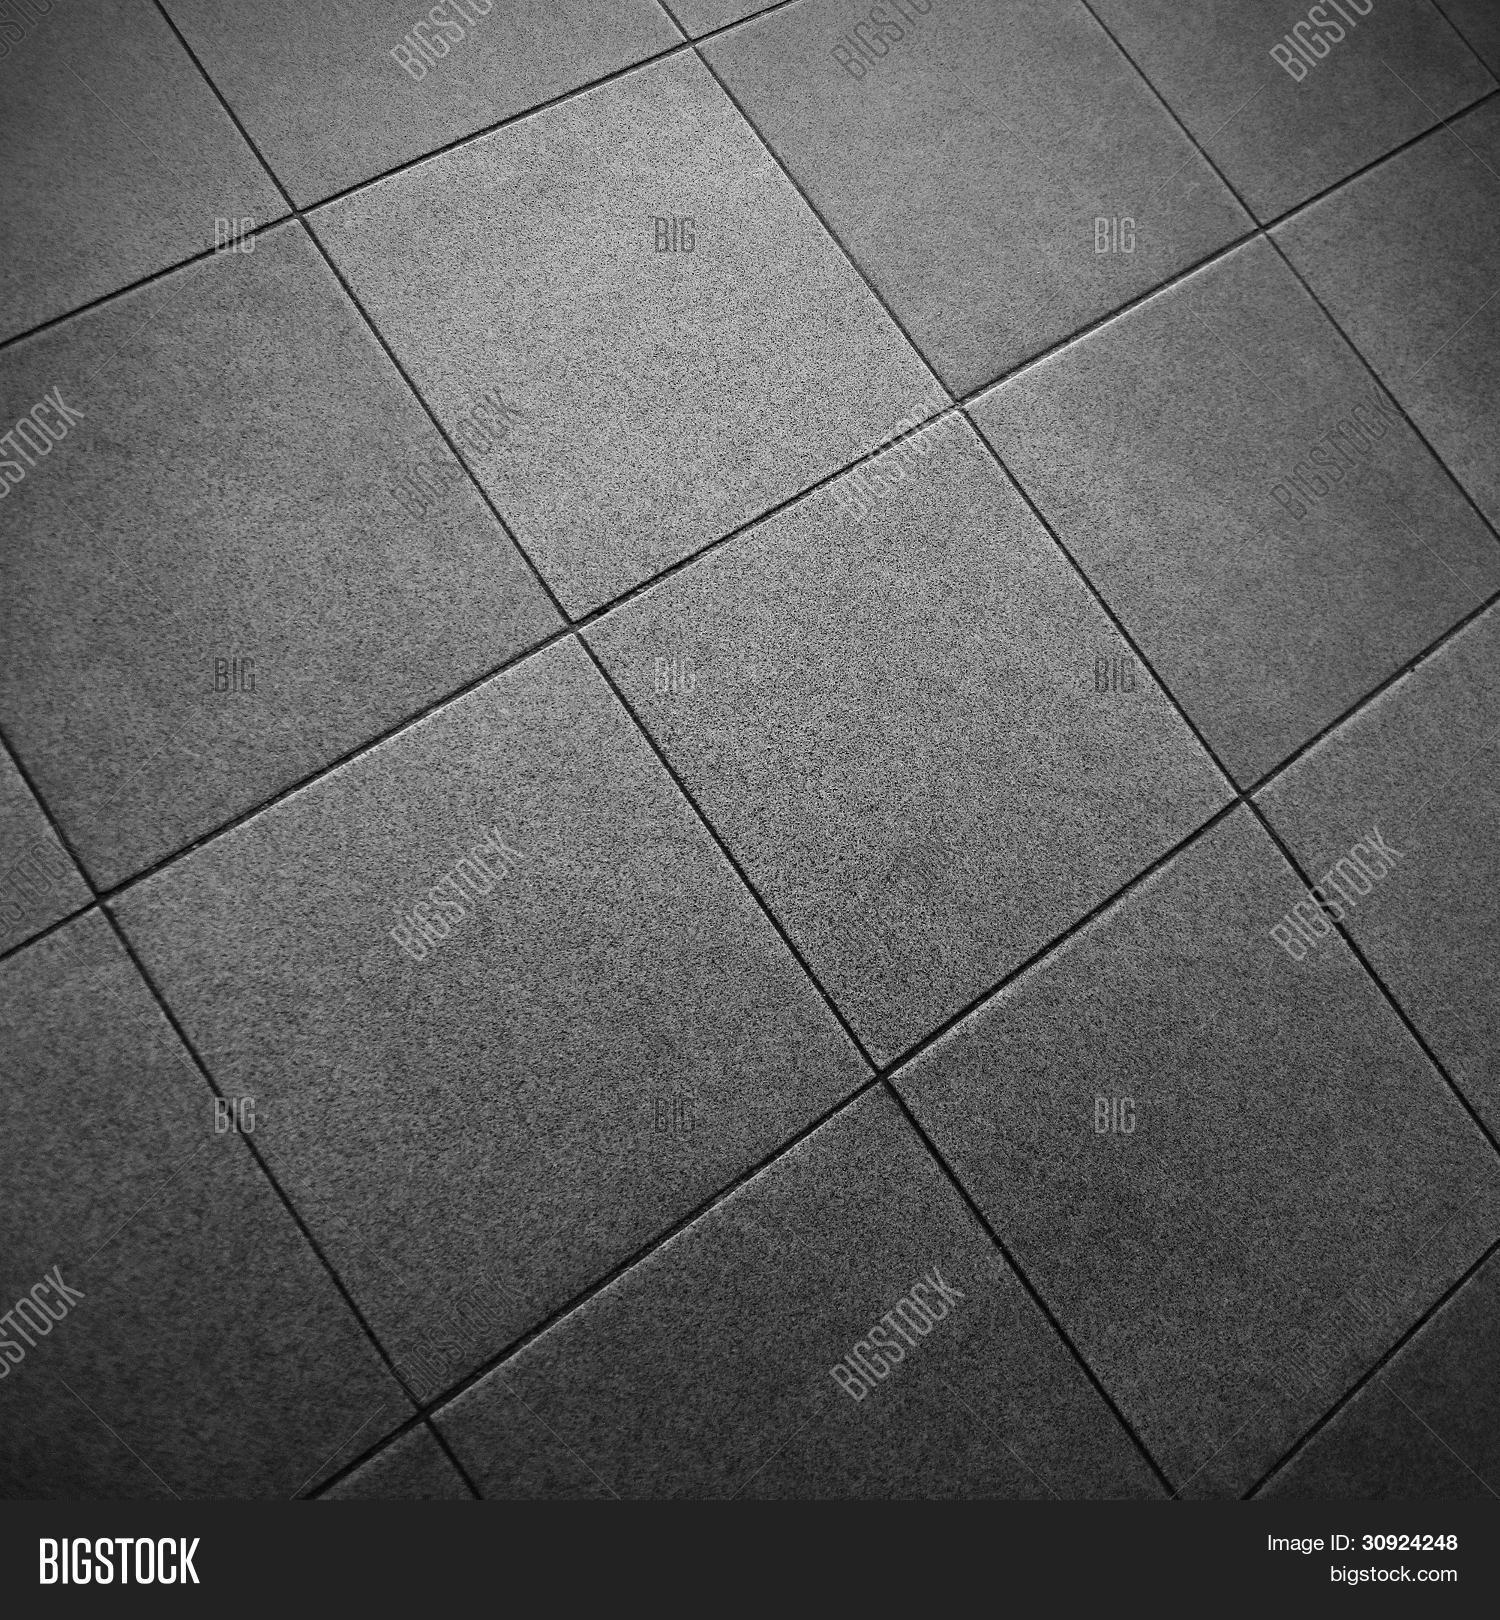 gray square tile floor image photo